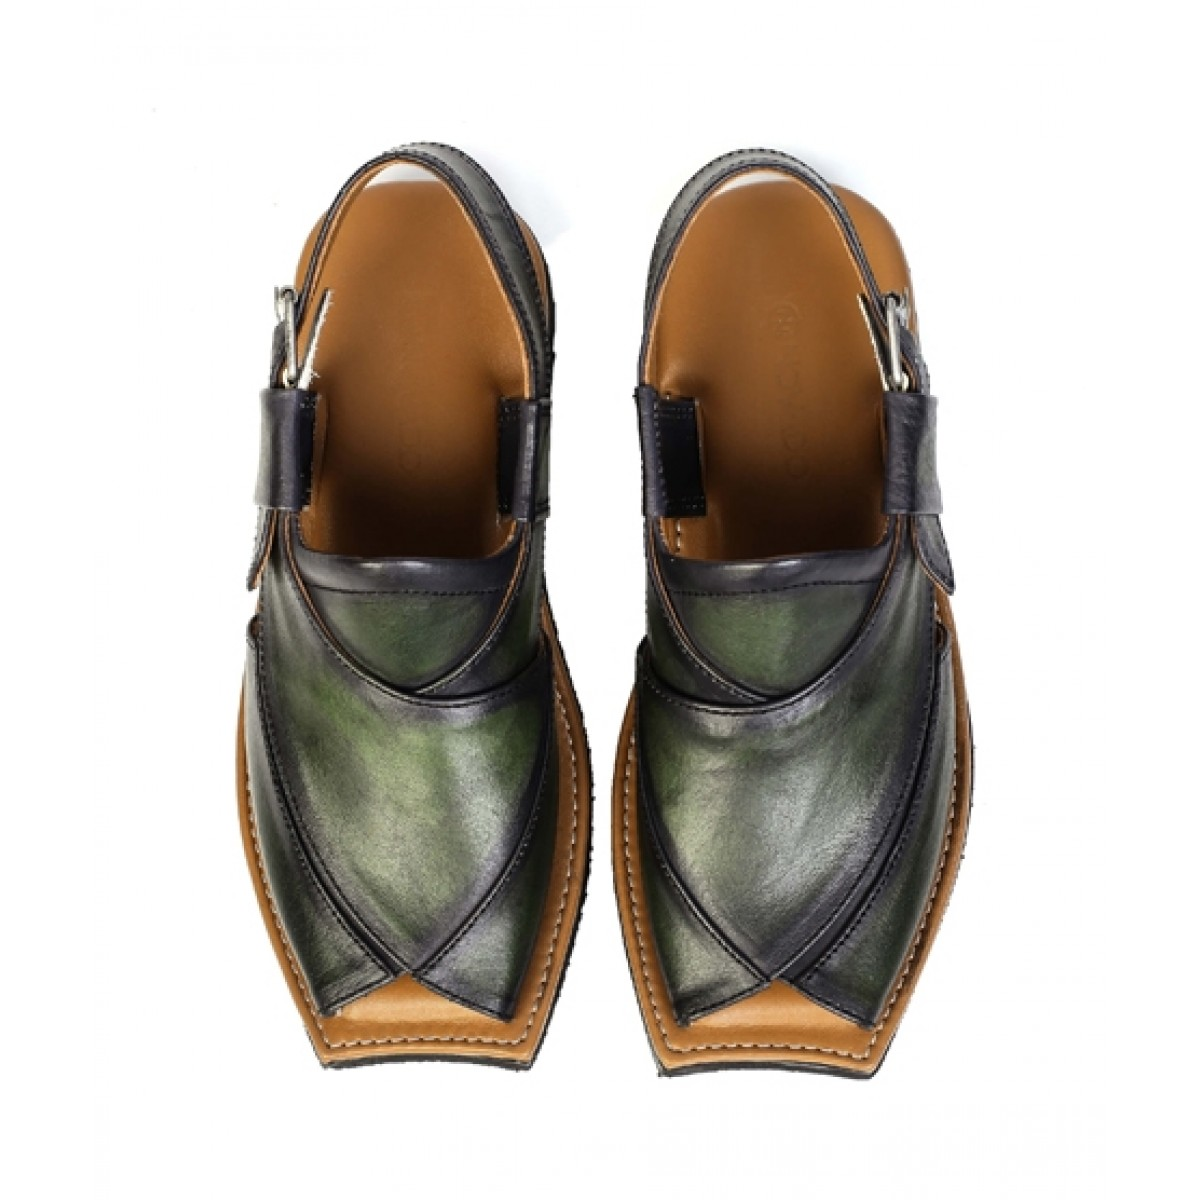 NOVADO Leather Peshawari Sandal For Men Watermelon Green (0021)